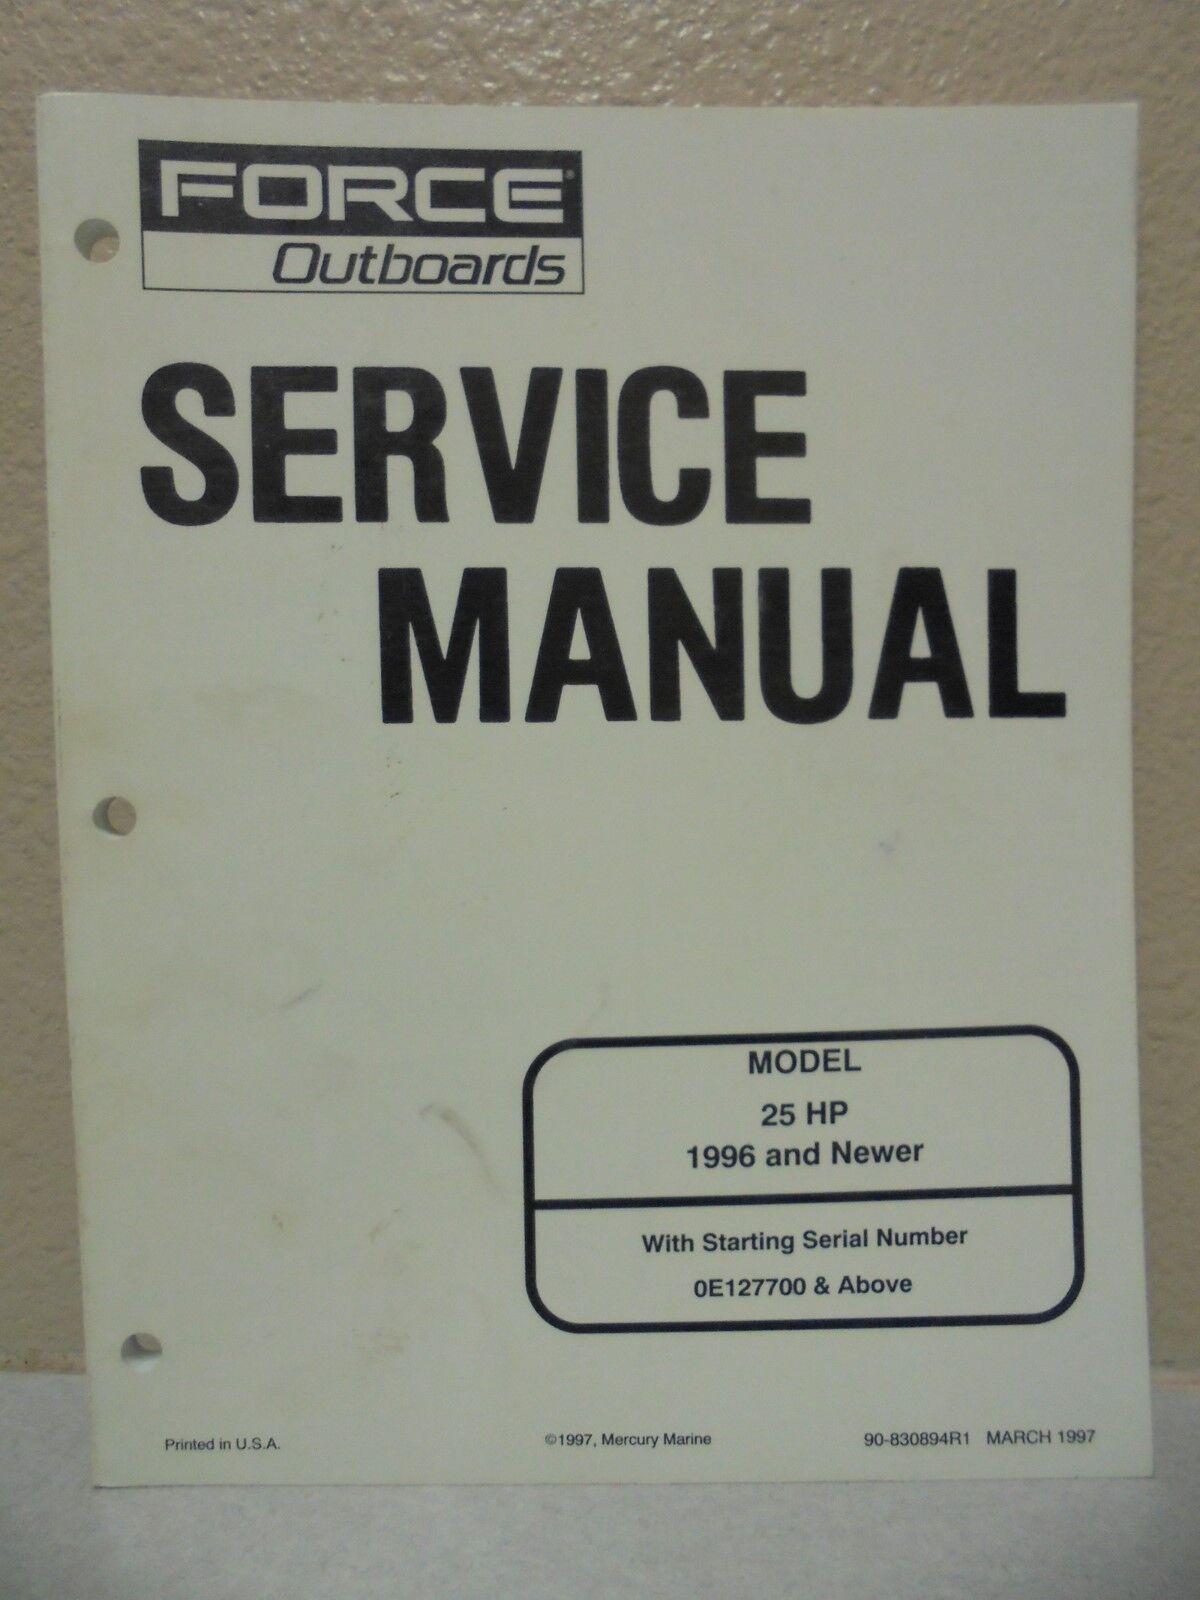 1996 mercury force outboard service manual 25 hp ebay rh ebay com 25 HP  Mercury Outboard Diagrams 25 Motor Mercury HP Fourstrock